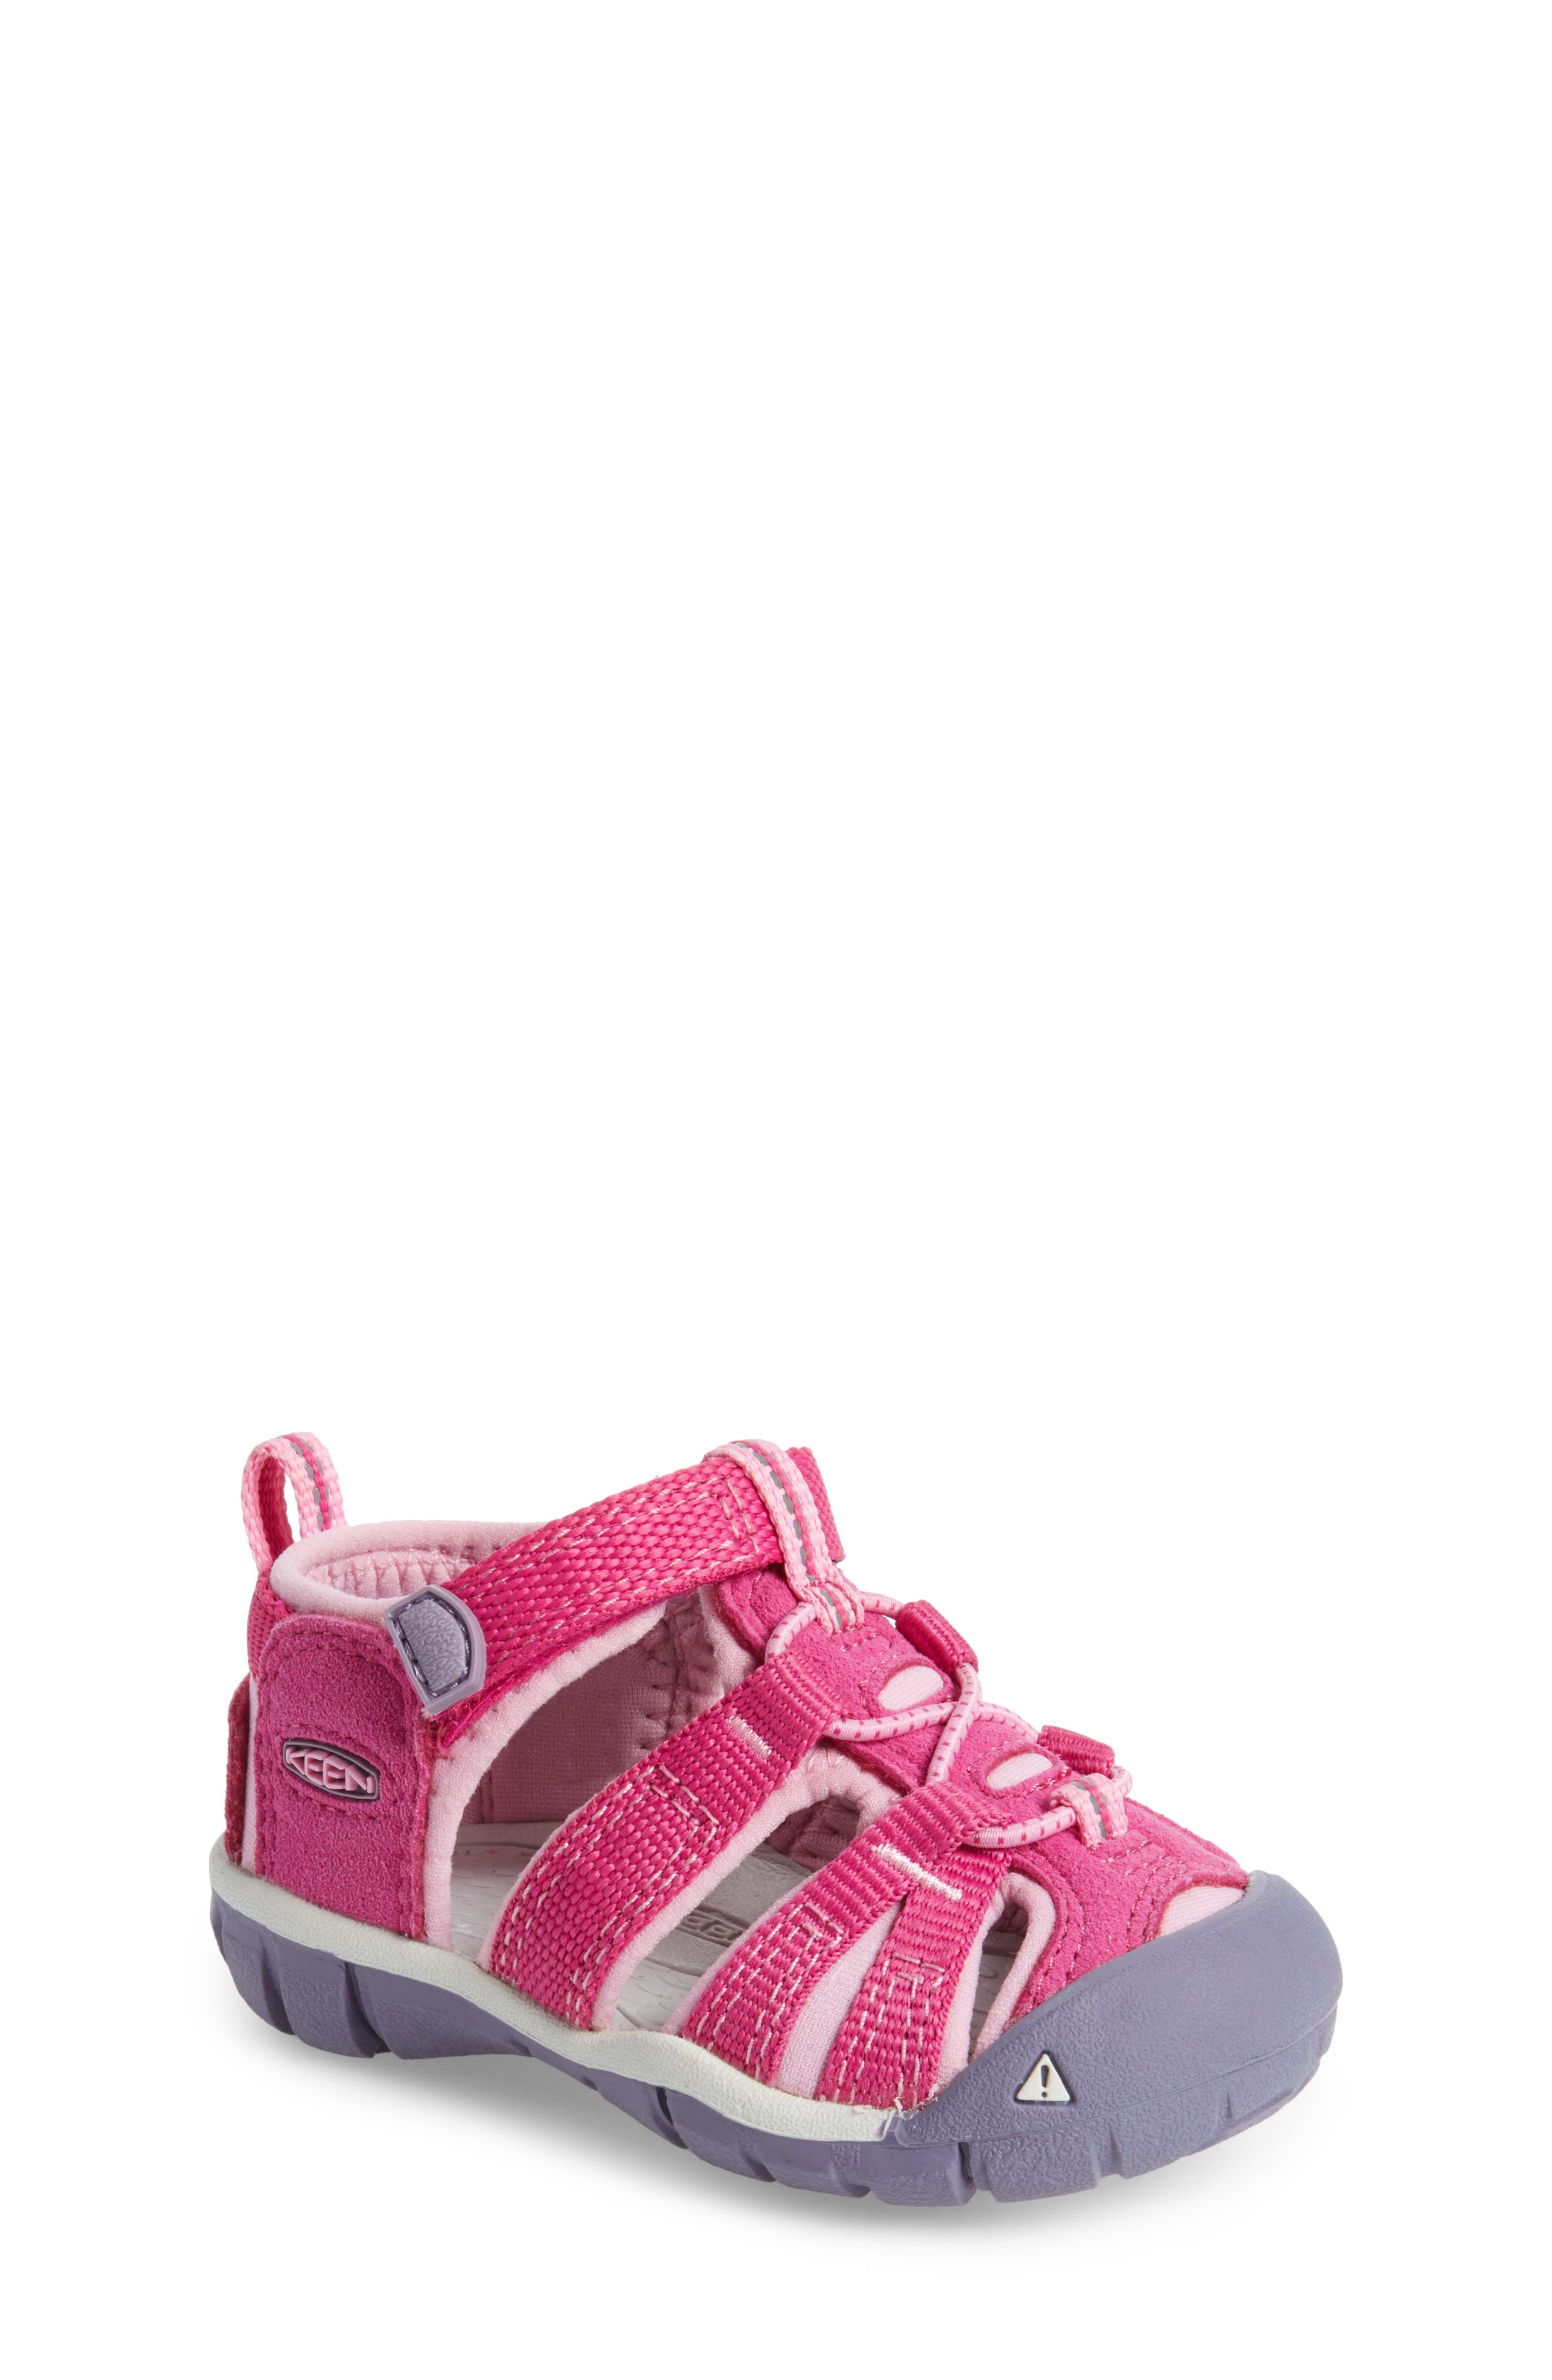 'Seacamp II' Water Friendly Sandal,                         Main,                         color, Very Berry/ Lilac Chiffon